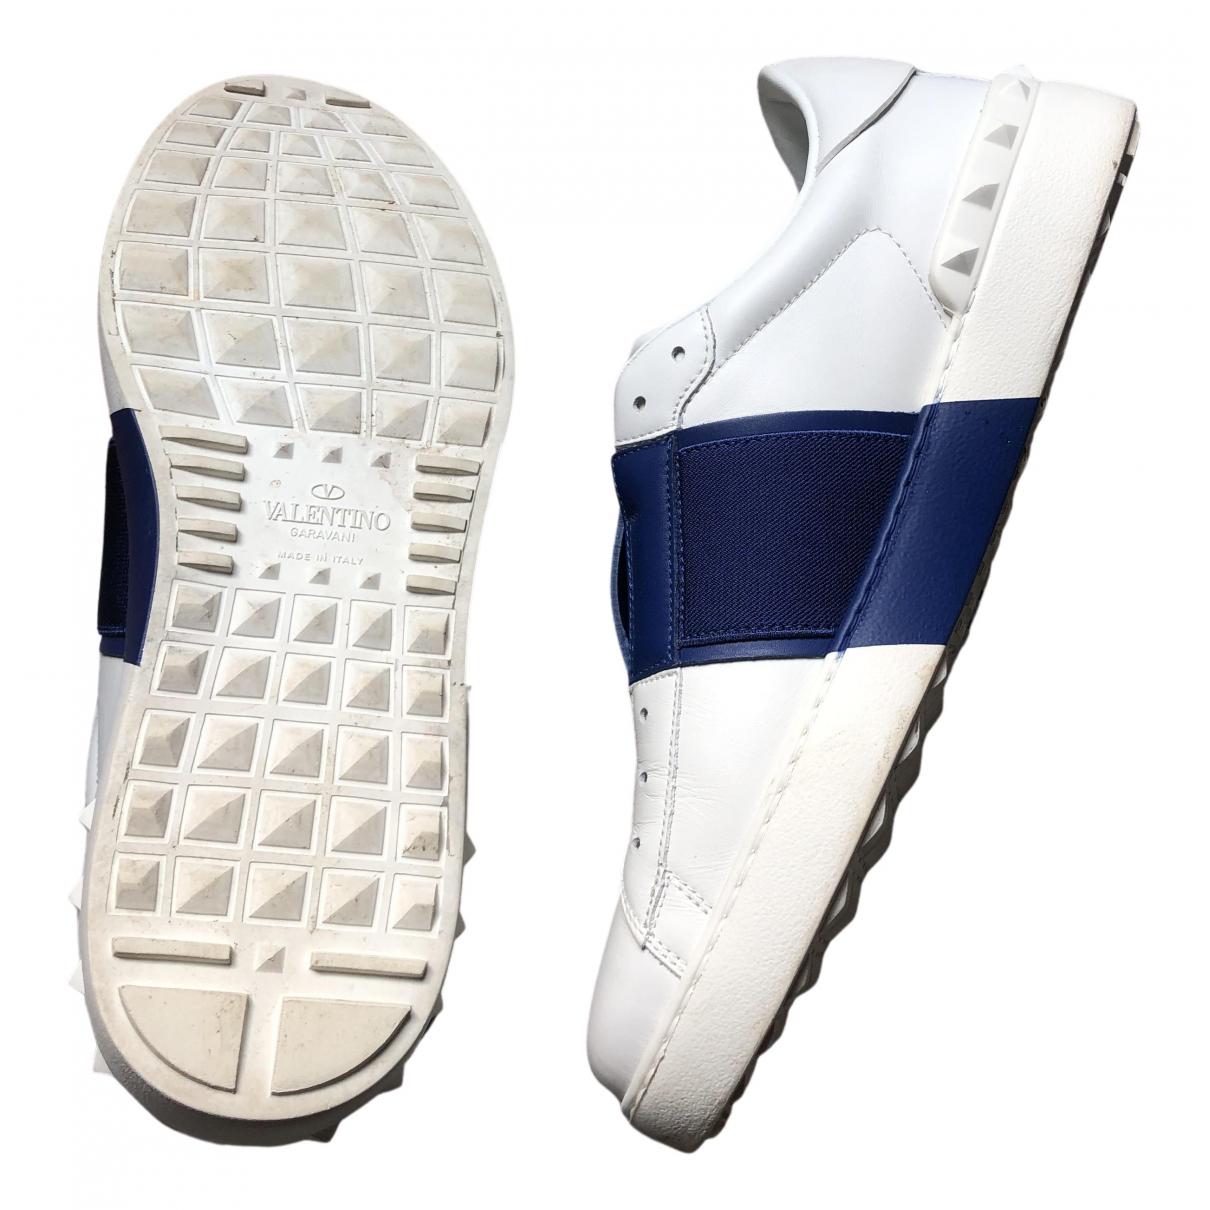 Valentino Garavani - Baskets Rockstud pour homme en cuir - blanc